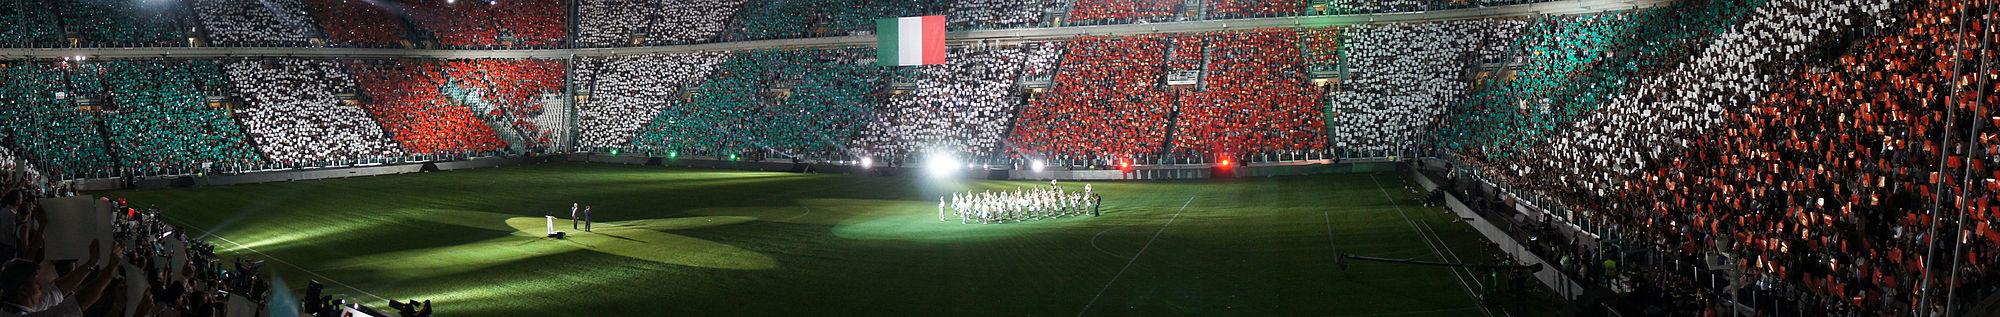 Juventus Stadium inauguration.jpg